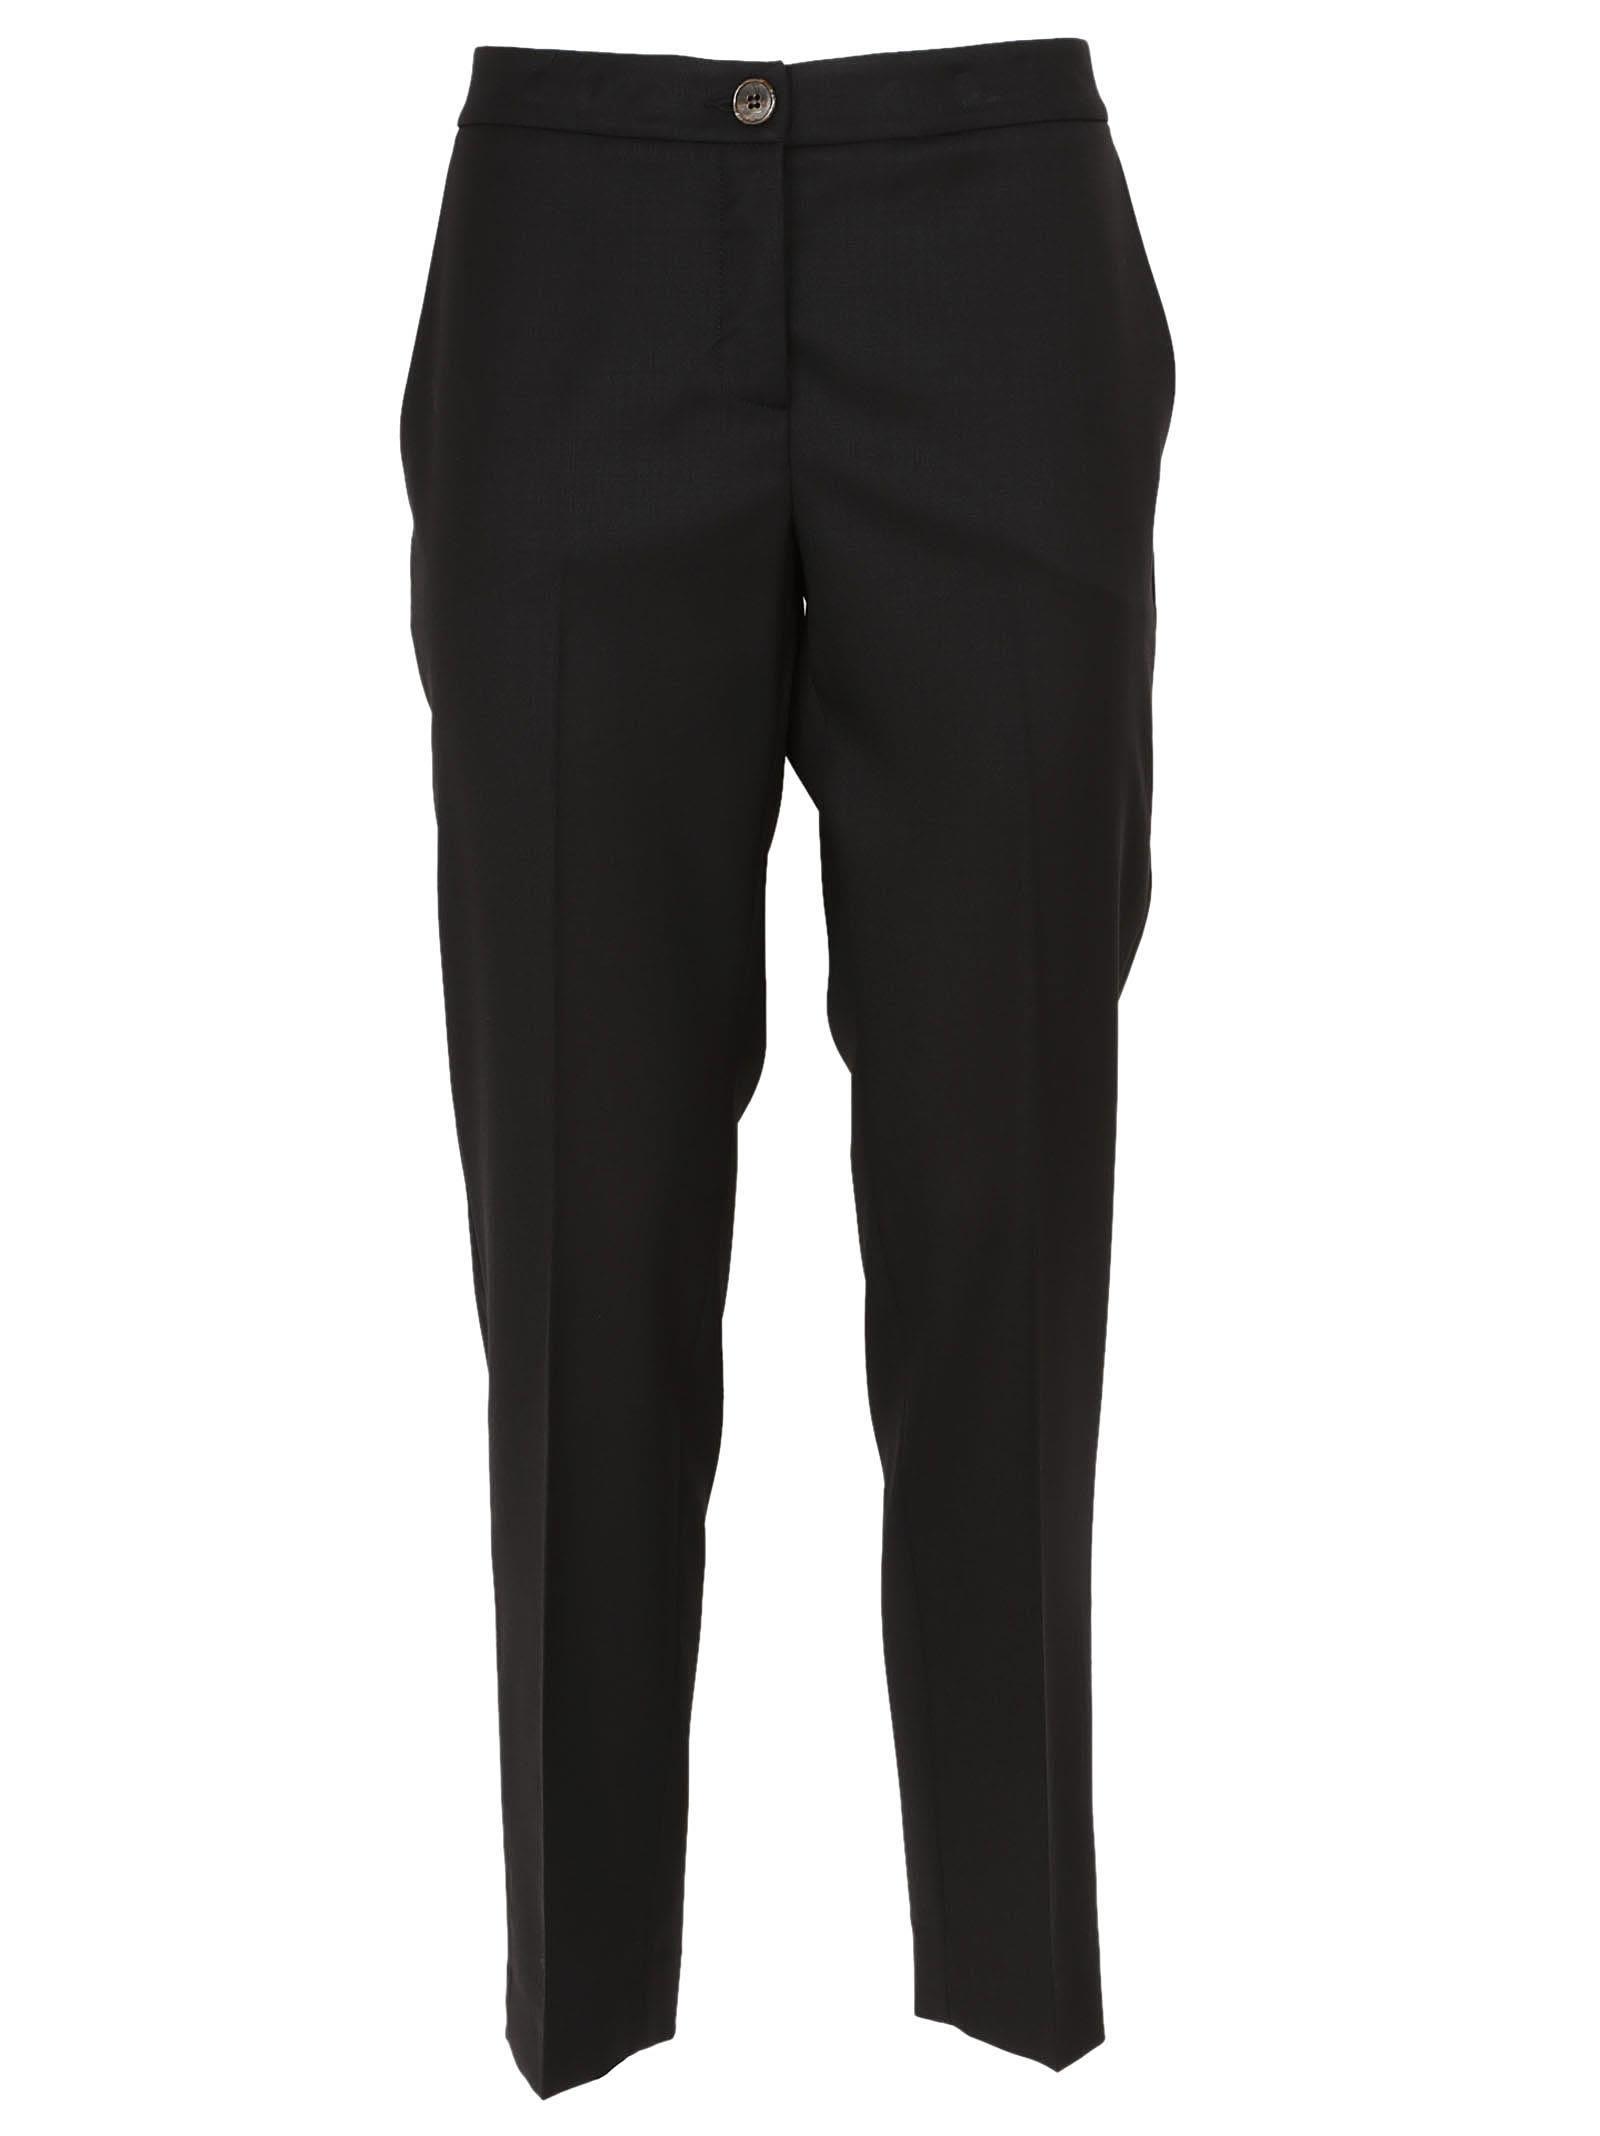 Erika Cavallini Classic Trousers